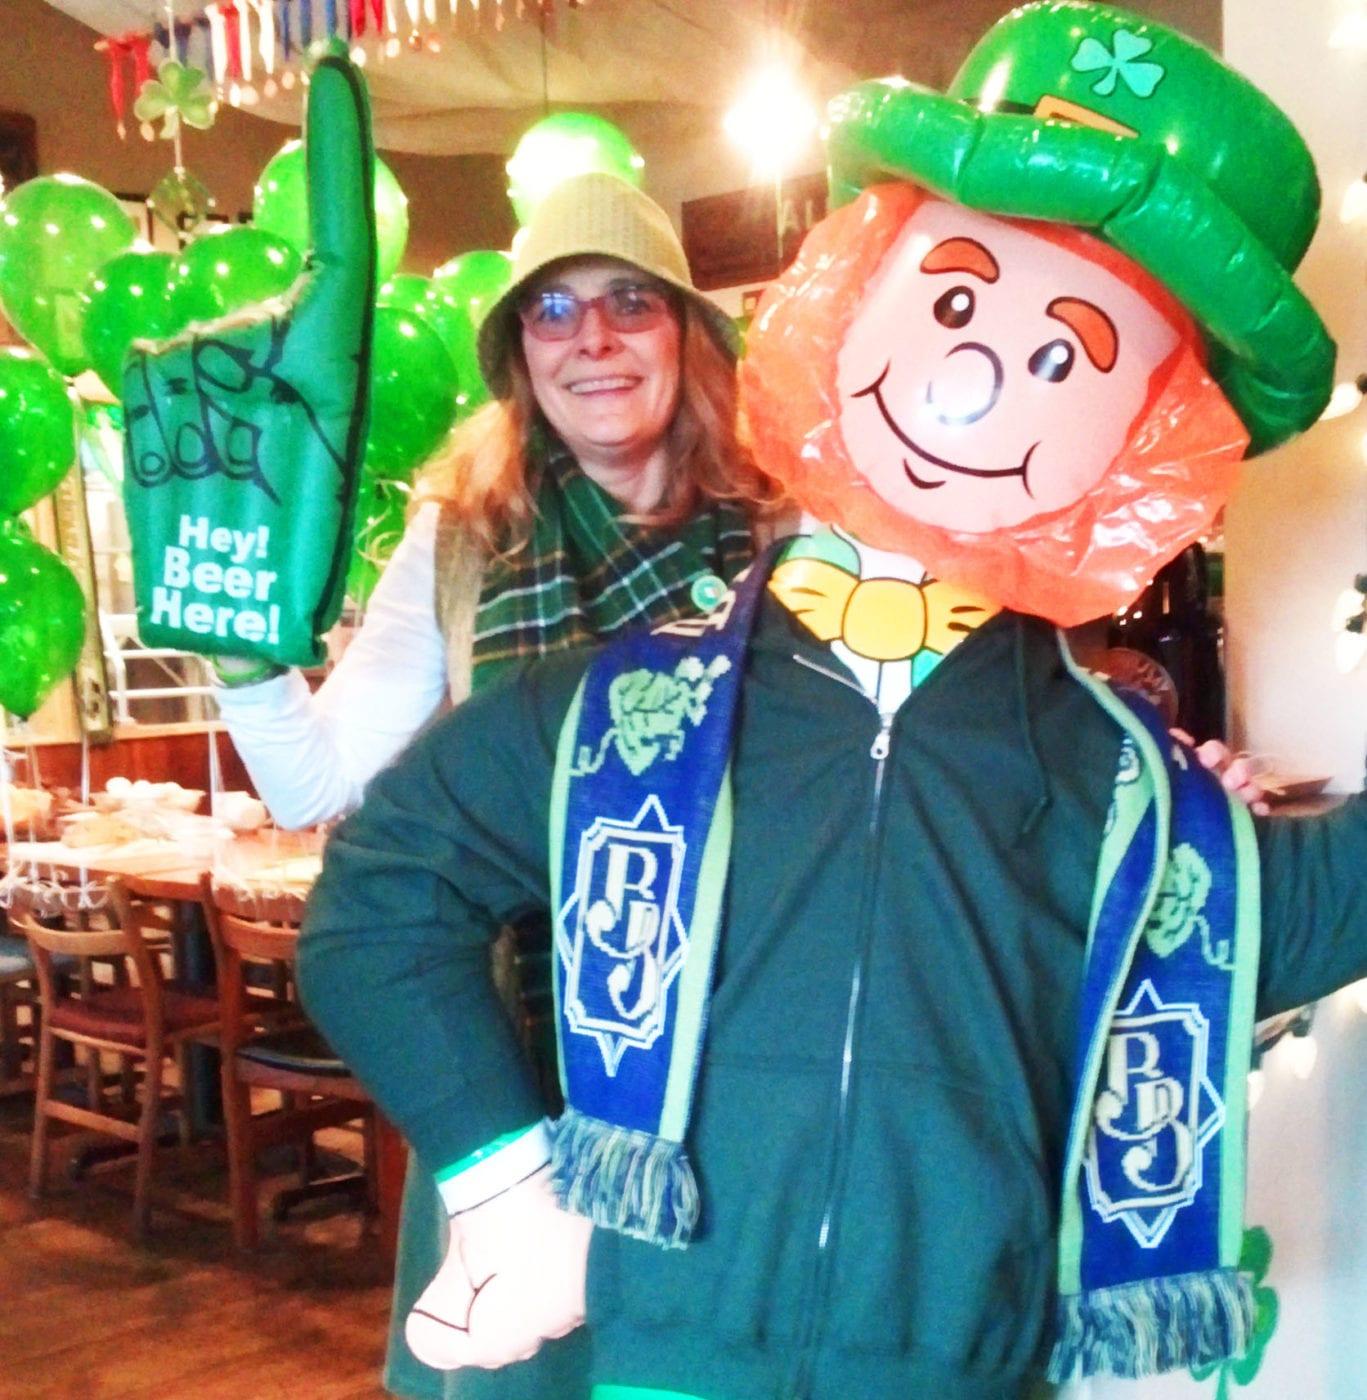 Boundary Bay Brewery, Janet Lightner, Bellingham, St. Patrick's Day, Craft Beer, Whatcom County, Parade